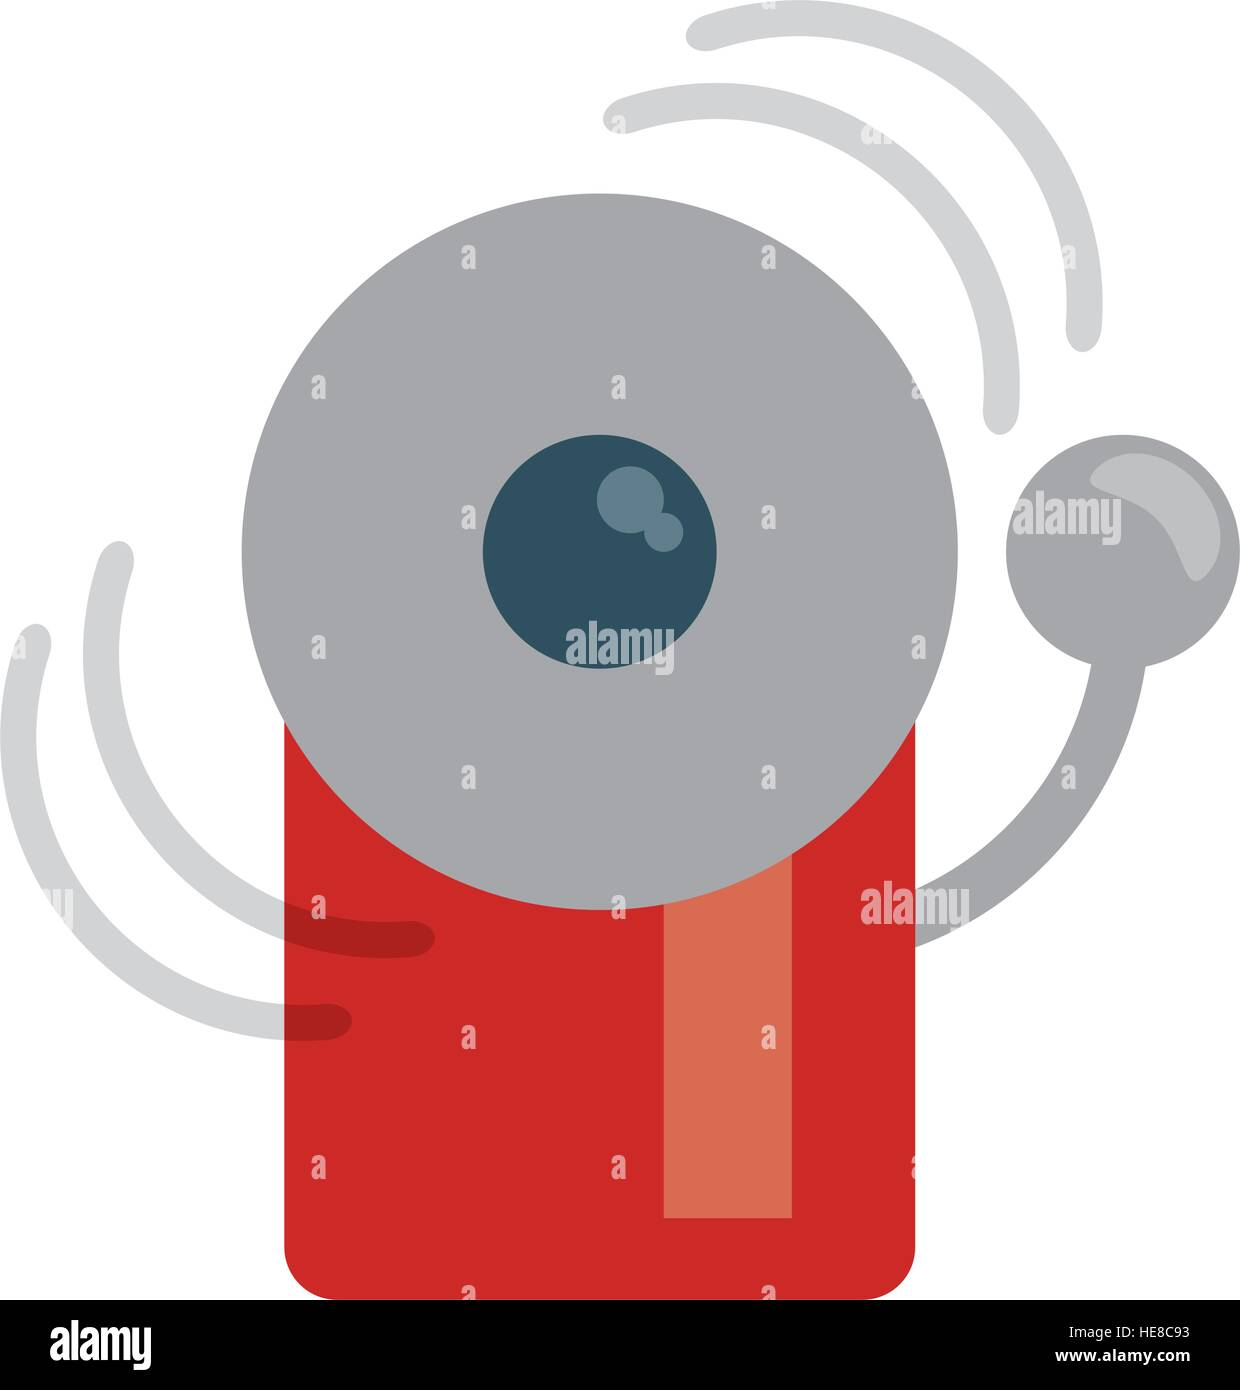 alarm fire emergency alert icon - Stock Image